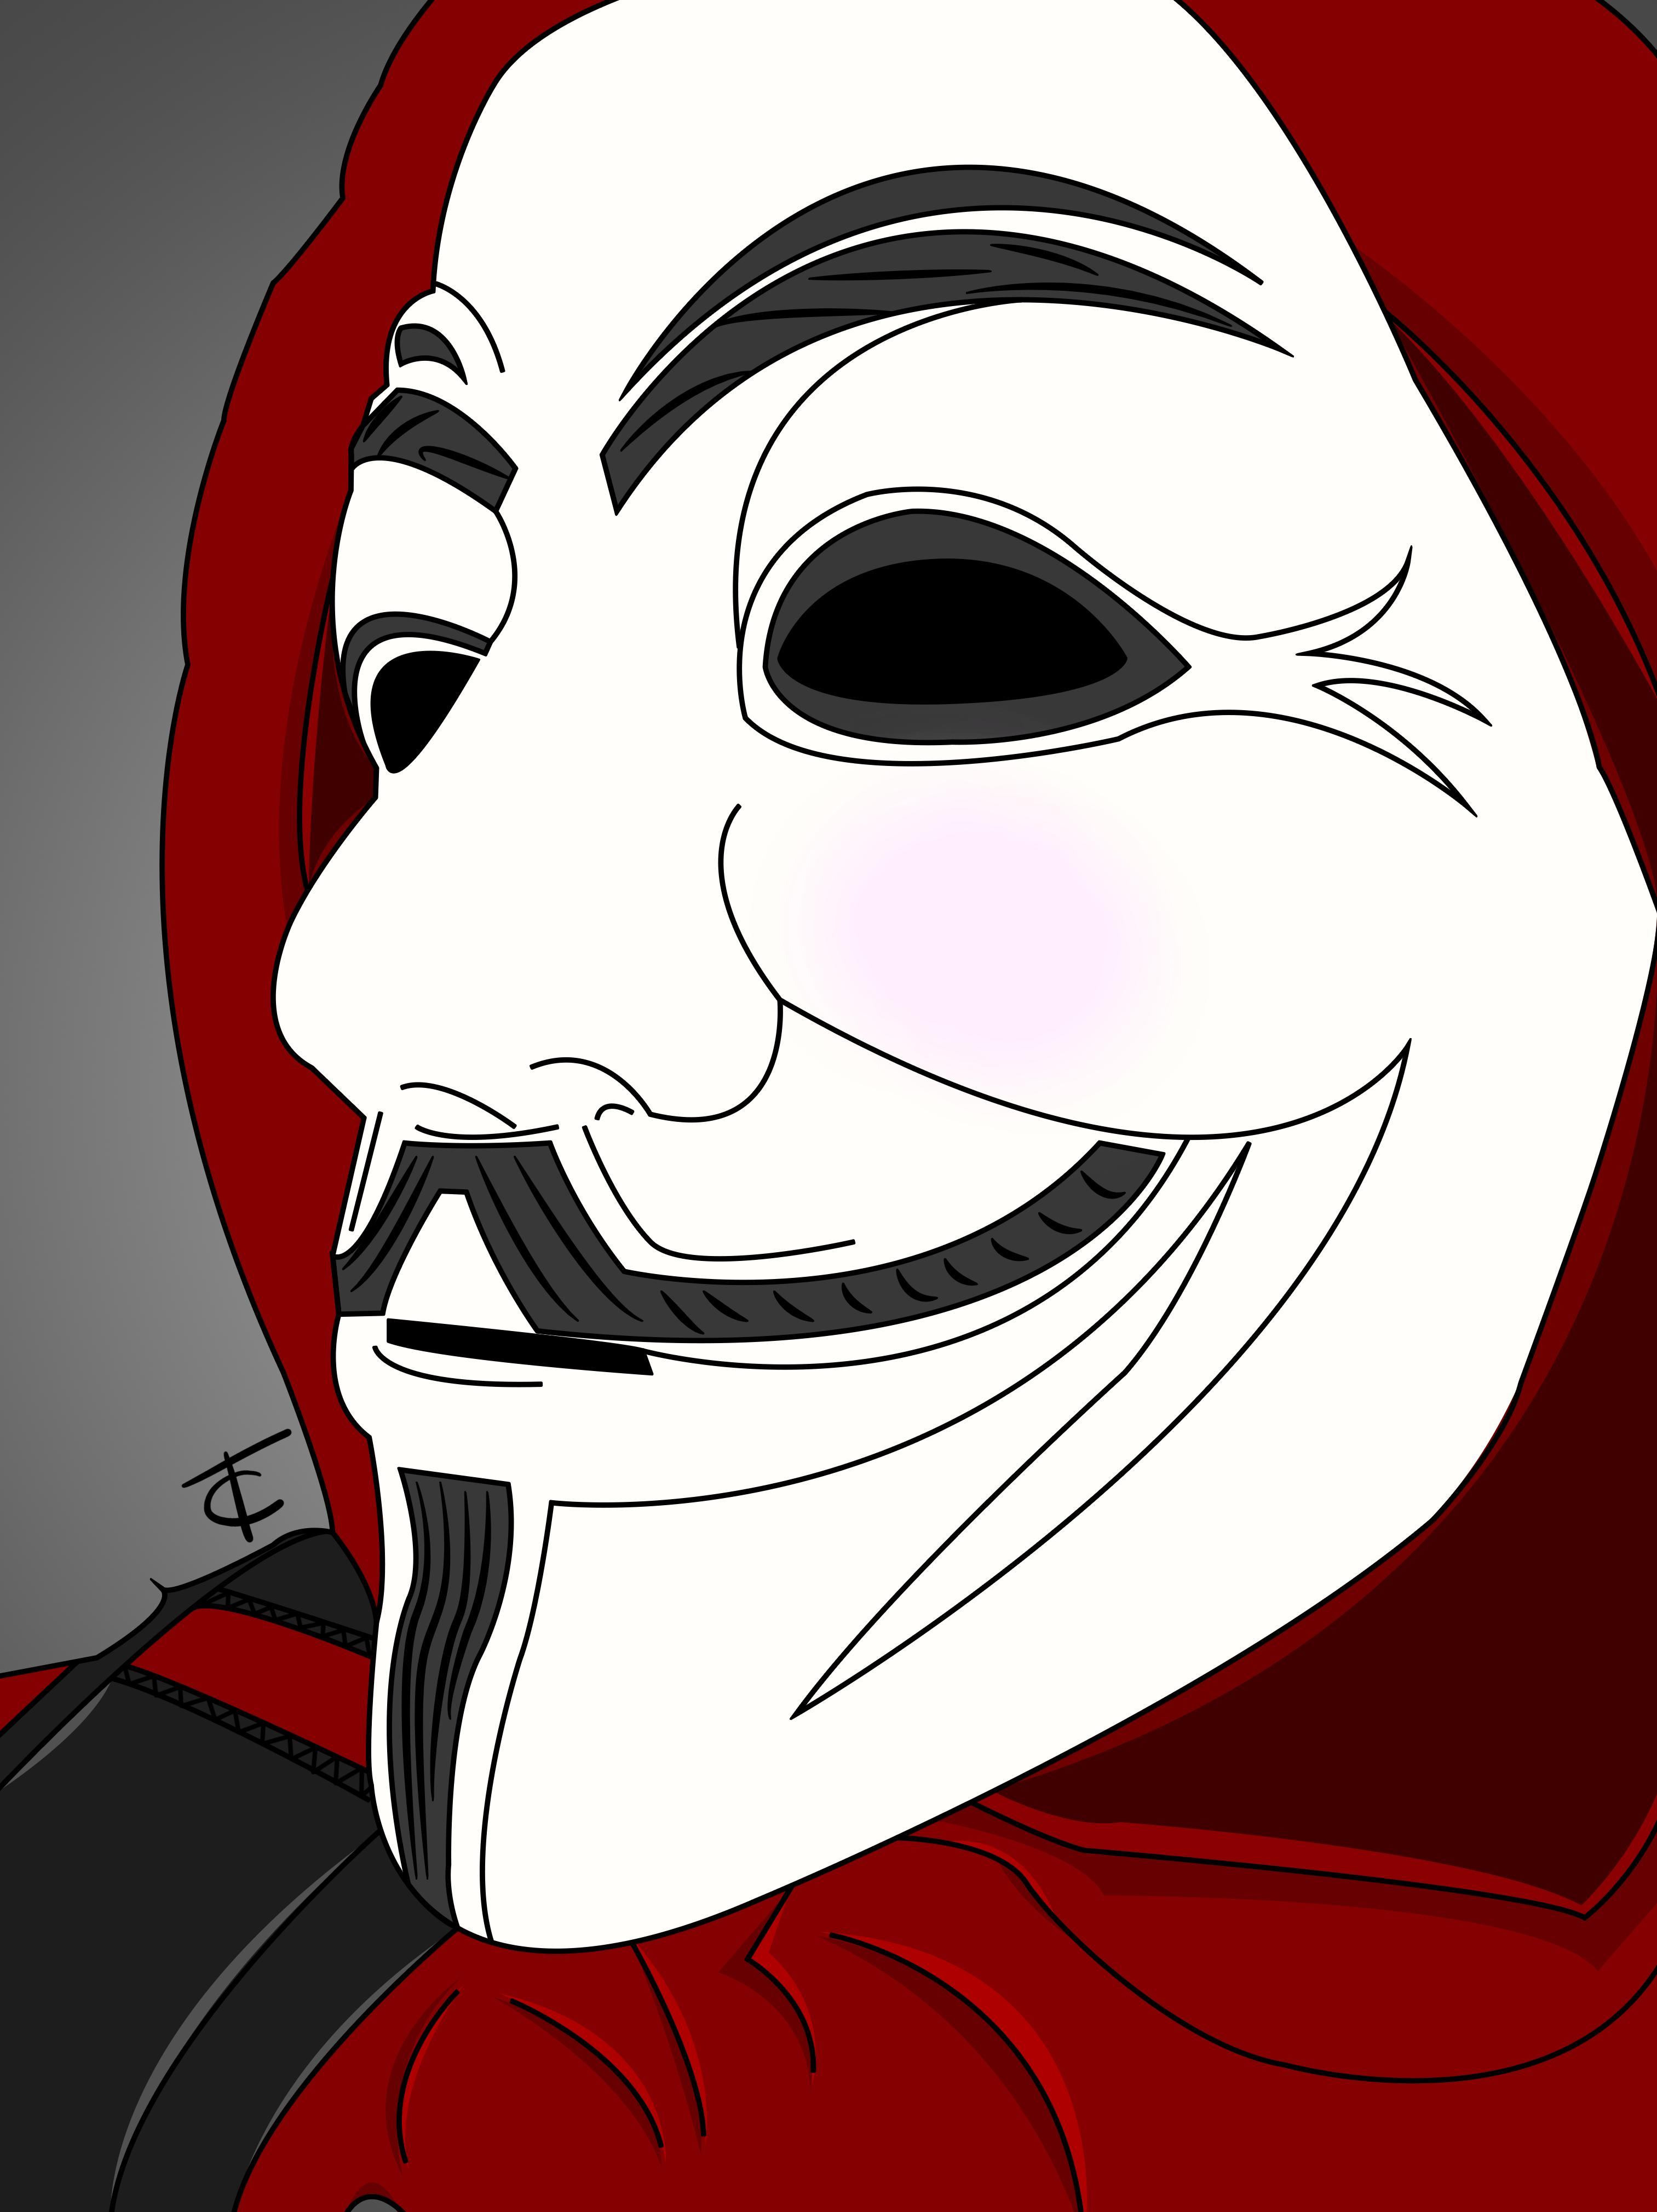 Anonv